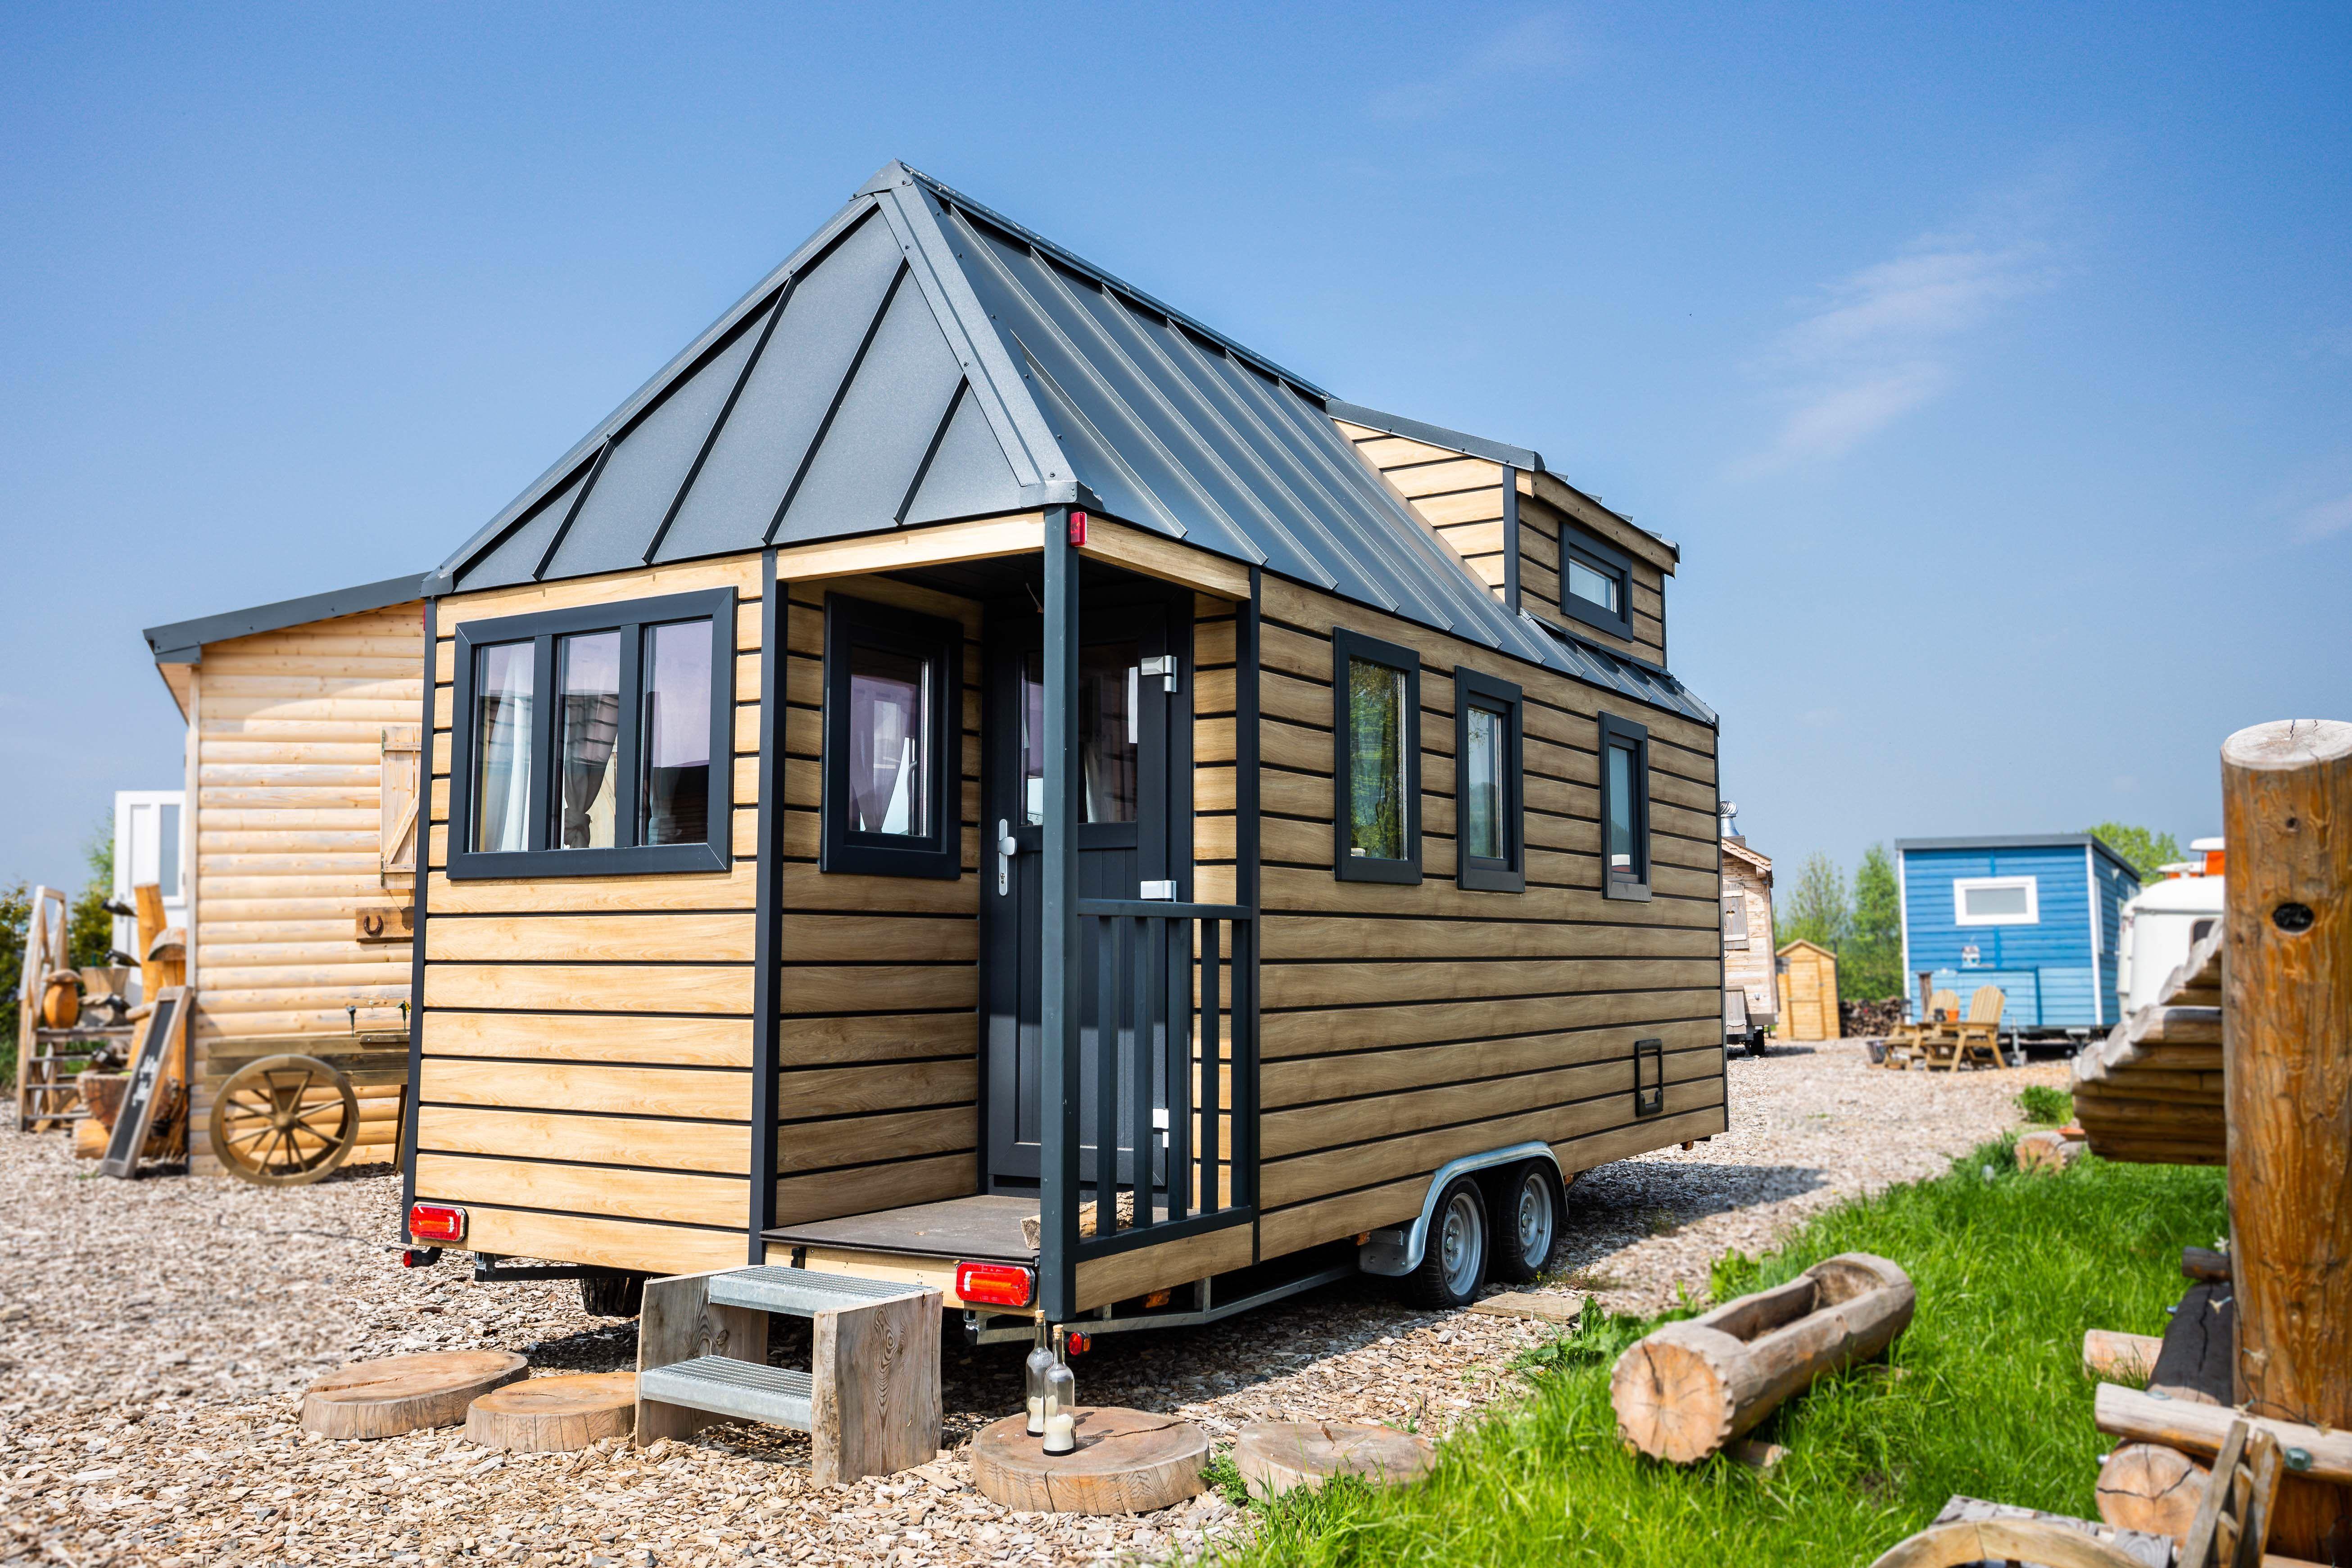 Mobiles Tiny House Australien House Haus Haus Auf Radern